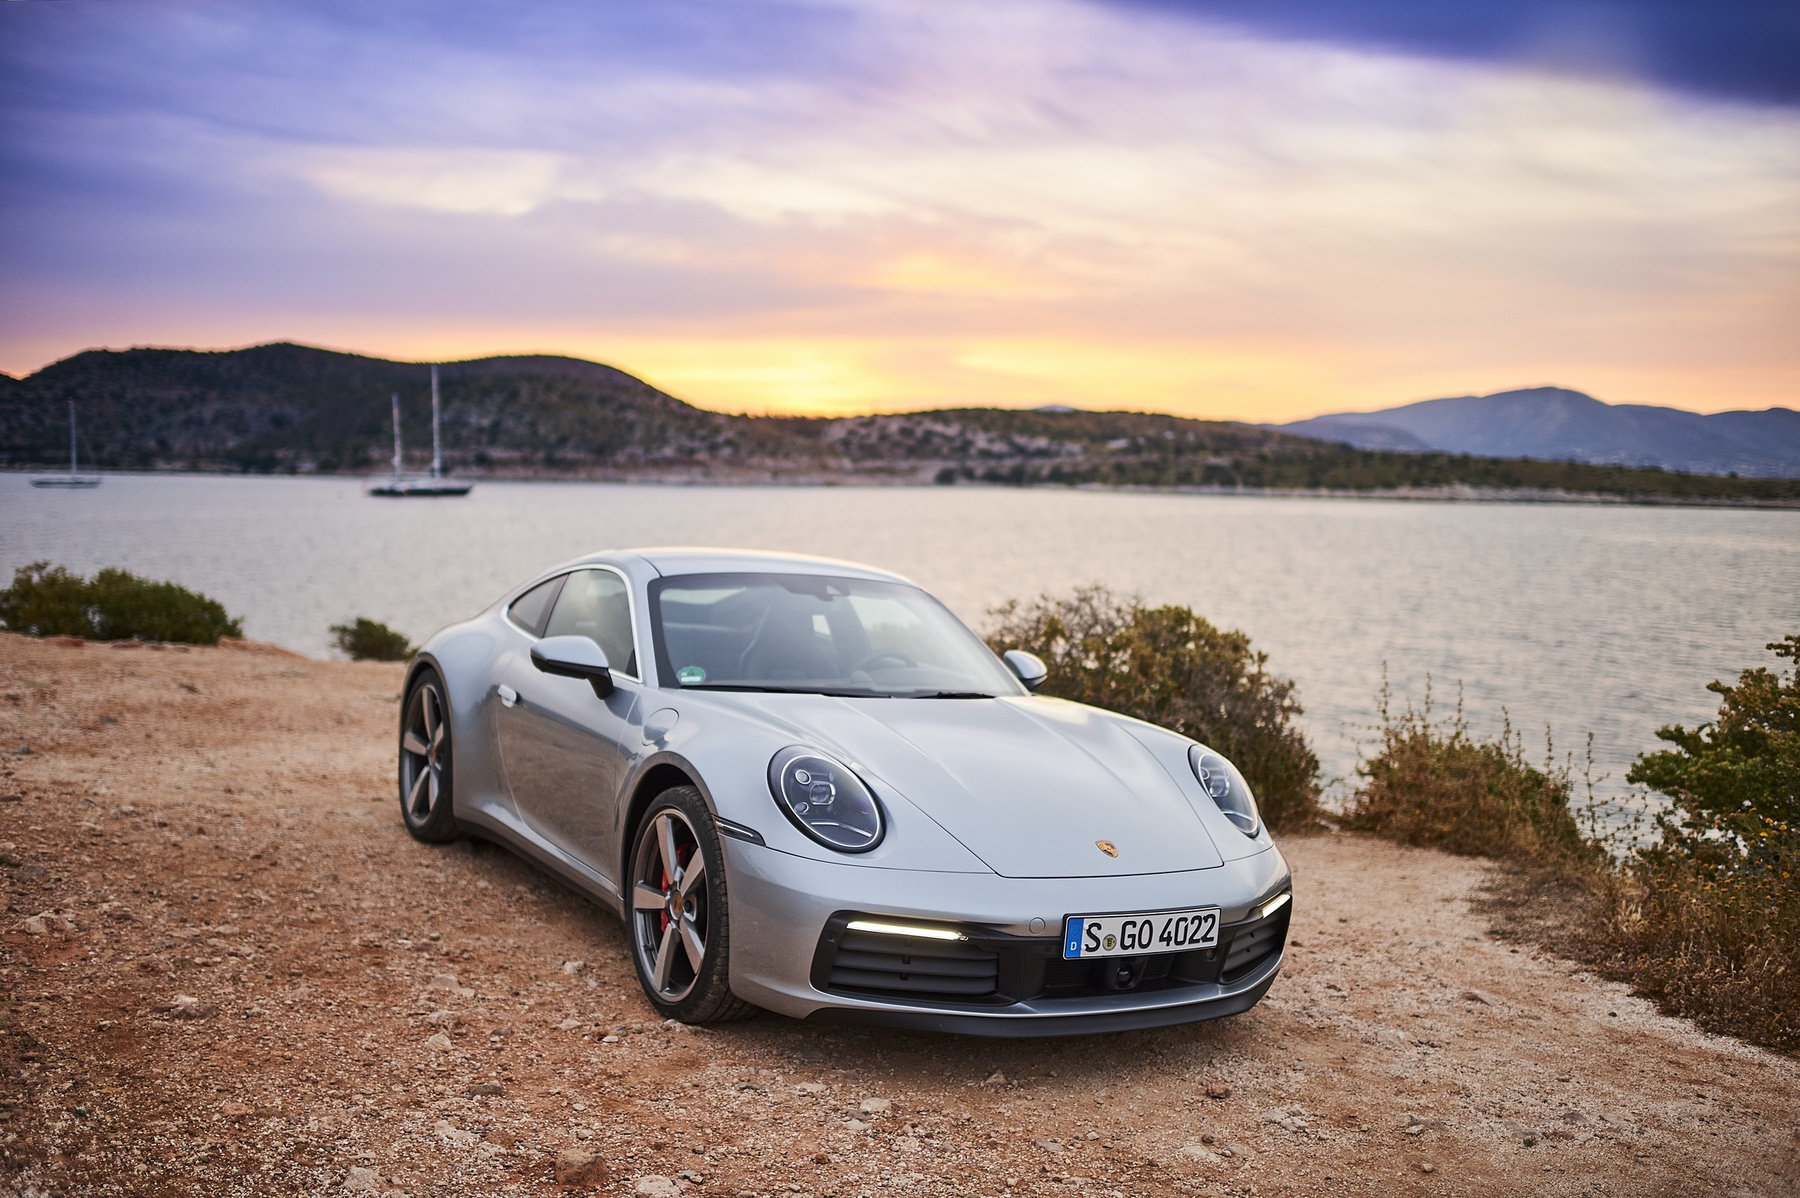 Test_Drive_Porsche_911_Athens_0177